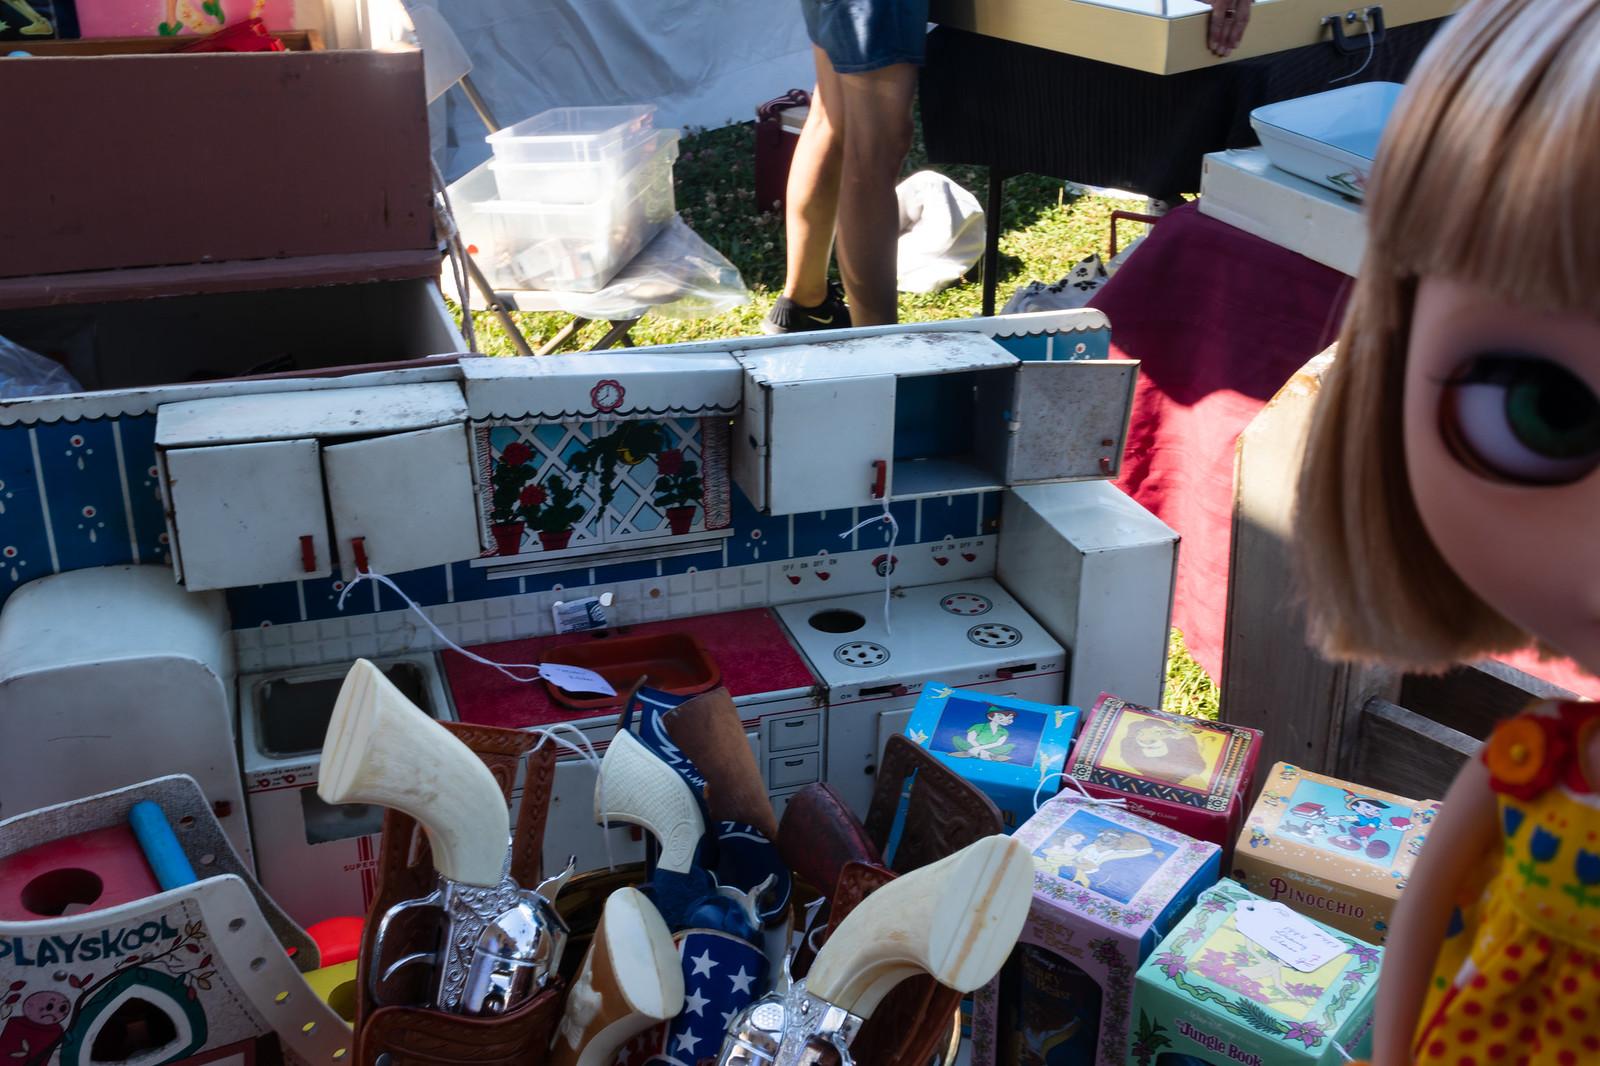 Stormville Flea Market